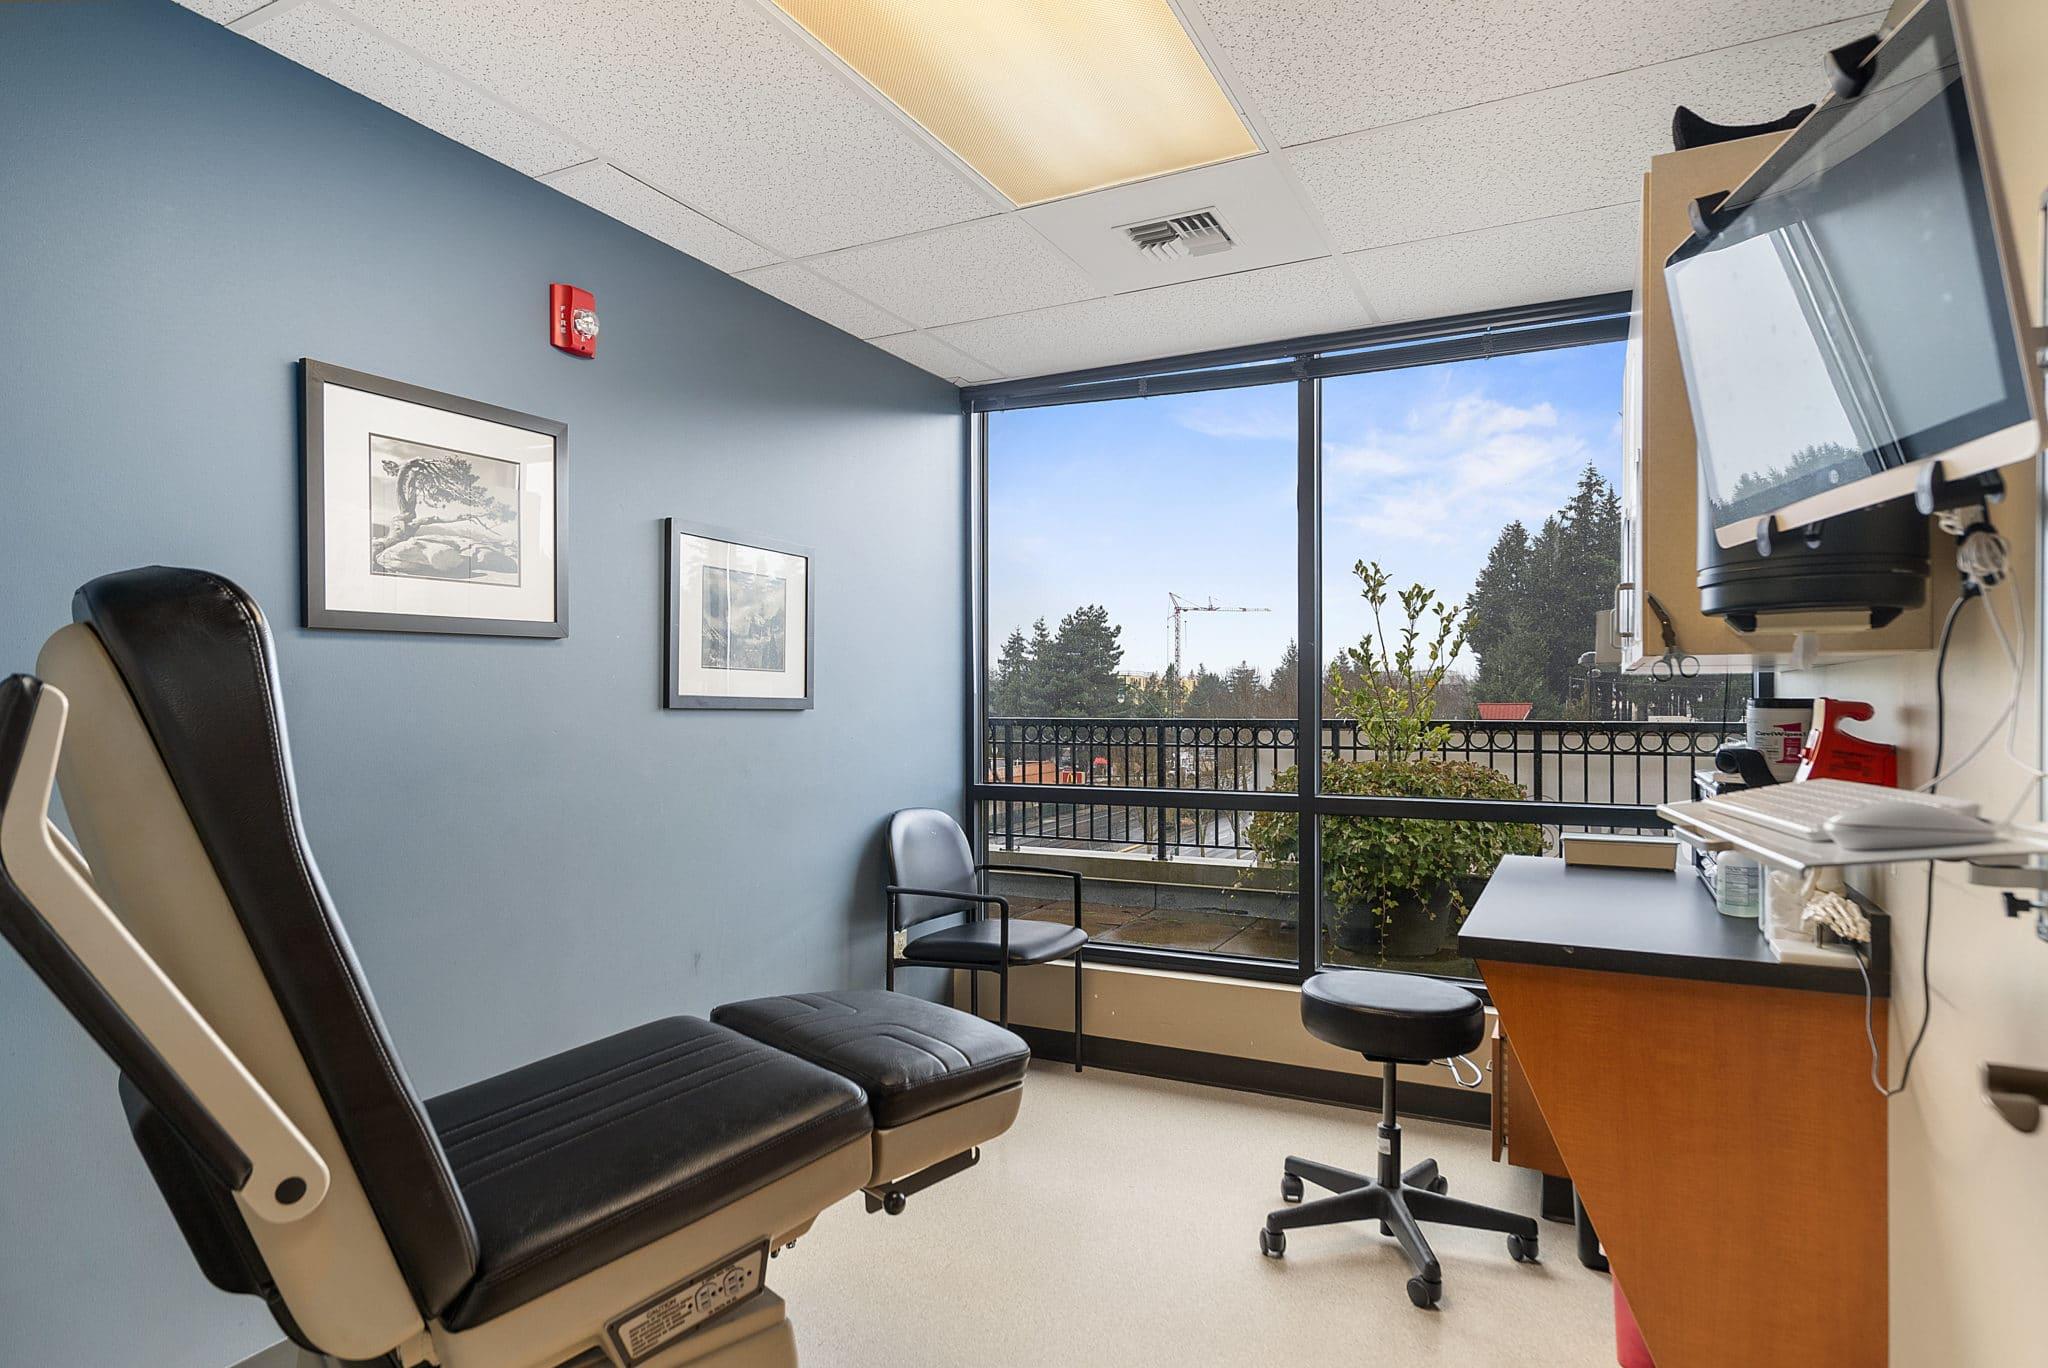 FASA Tacoma Patient room 2